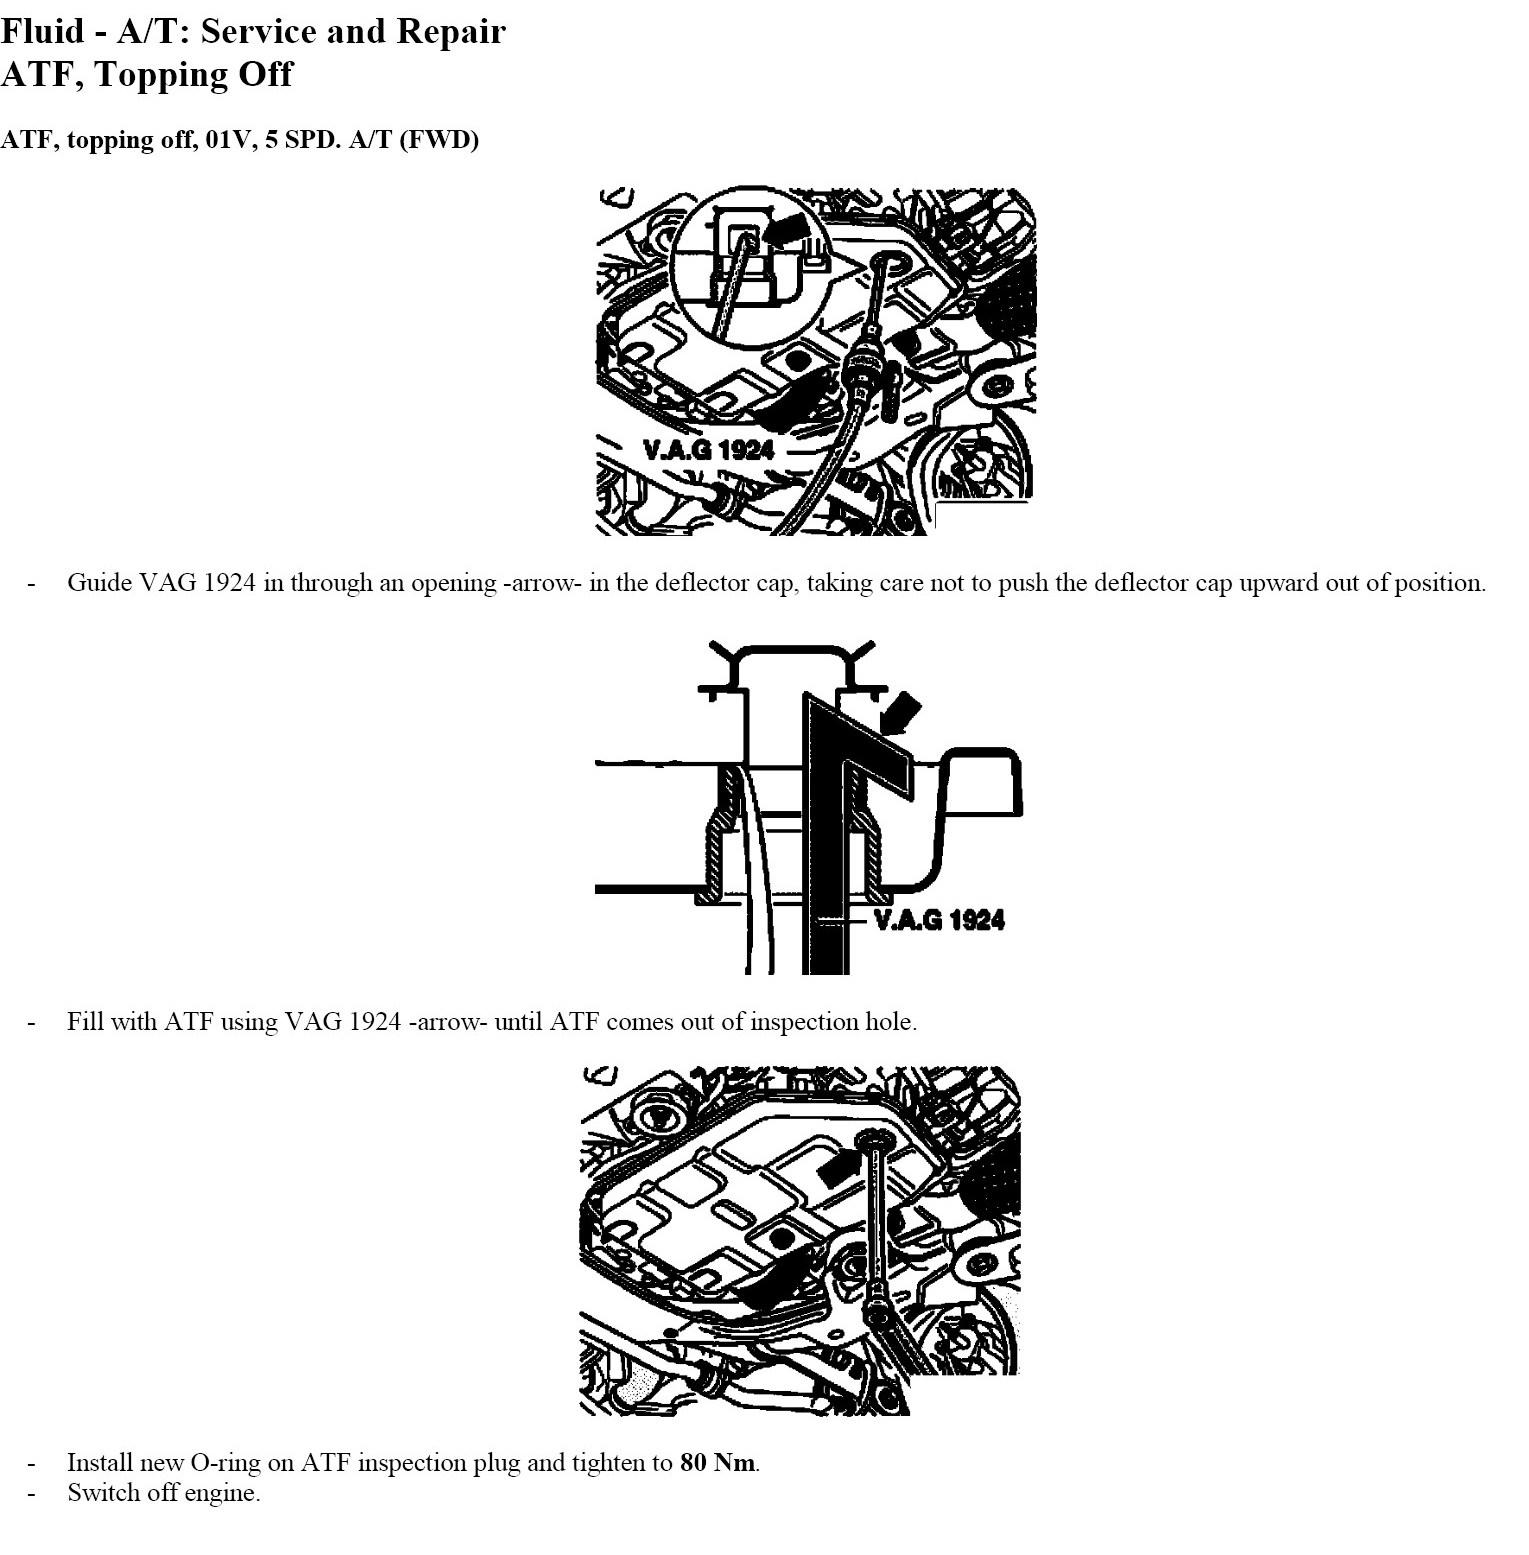 2010 Volkswagen Passat Transmission: 2004 VW Passat. Drained Transmission Oil By Mistake